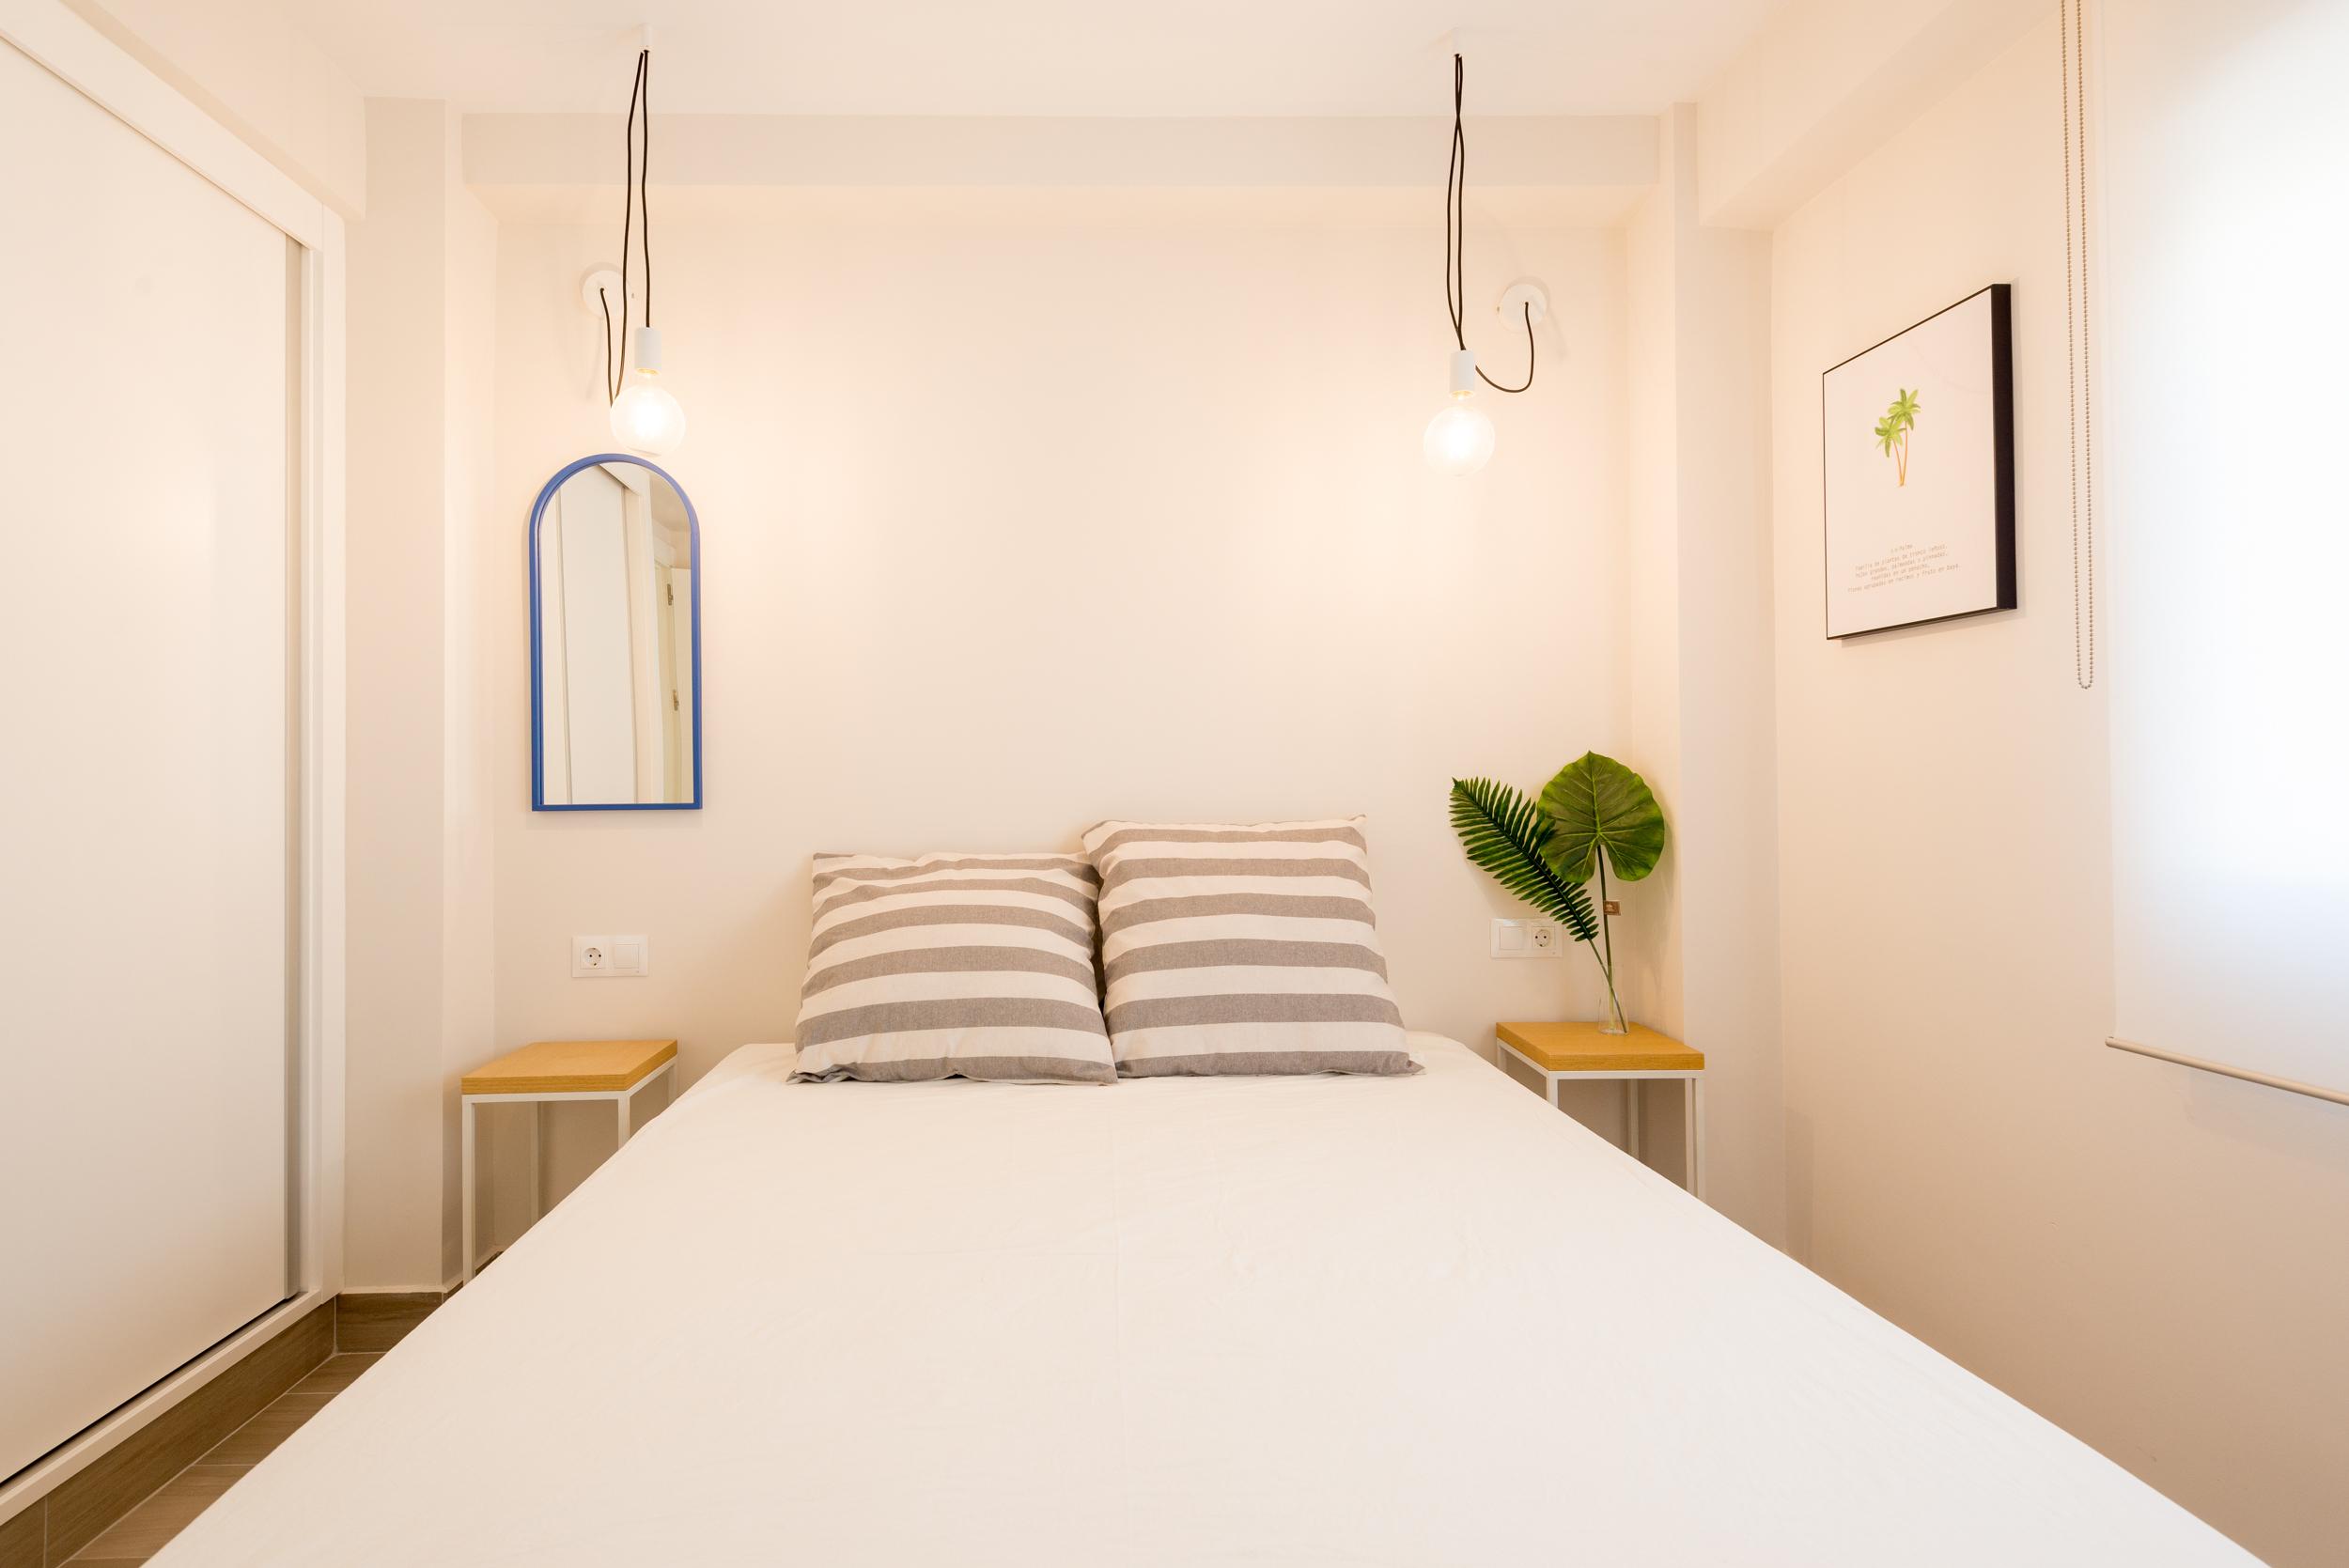 Apartment MalagaSuite City Center Enriqueta photo 18642642